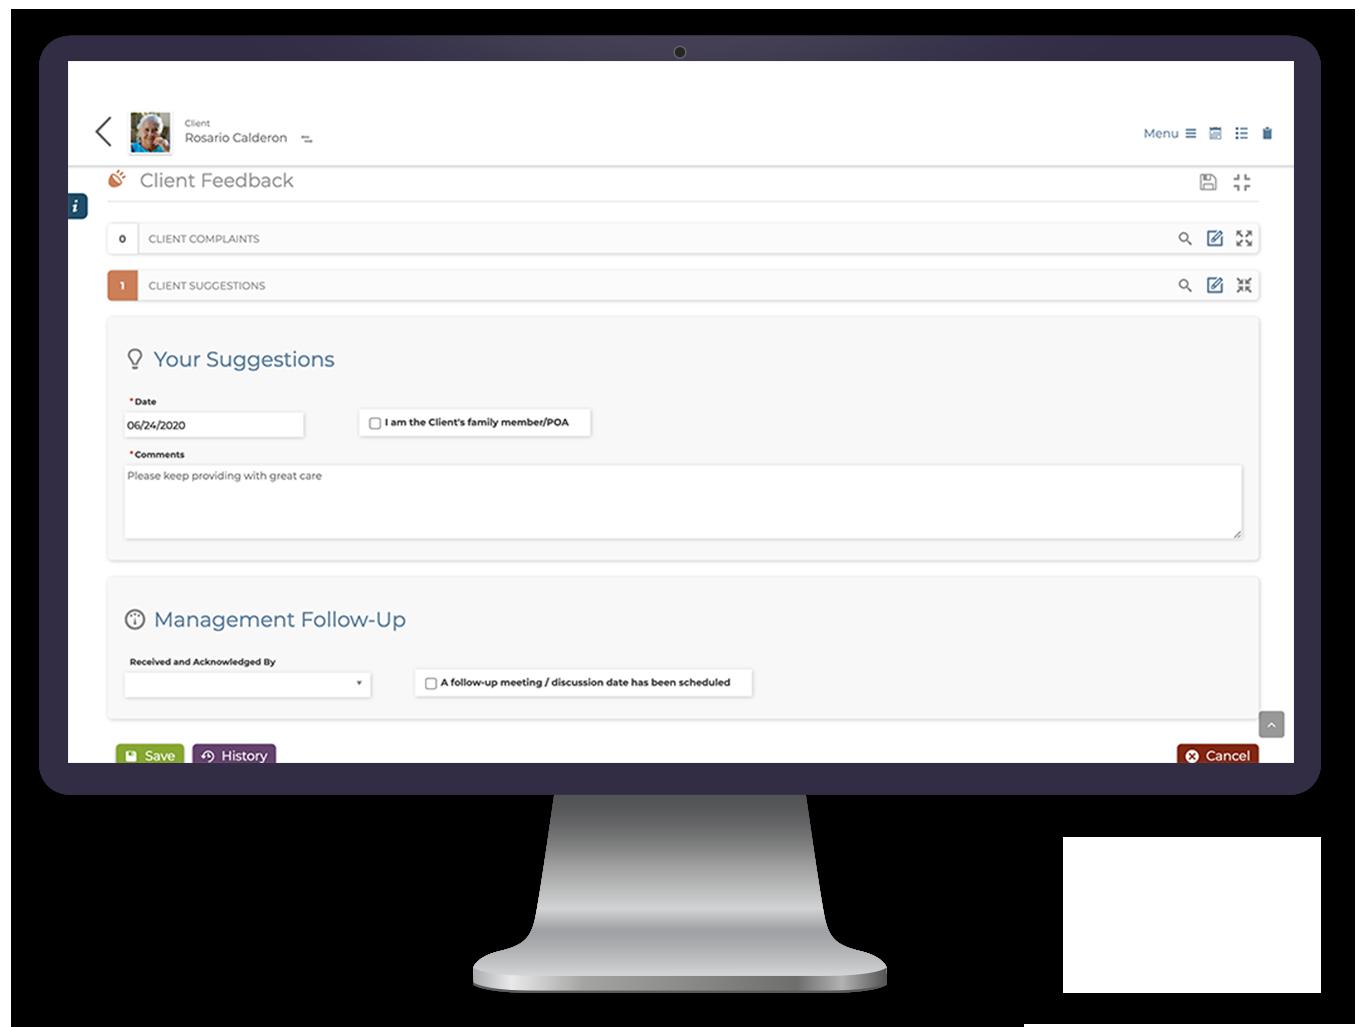 Customer and Business Intelligence - SMARTcare Desktop App